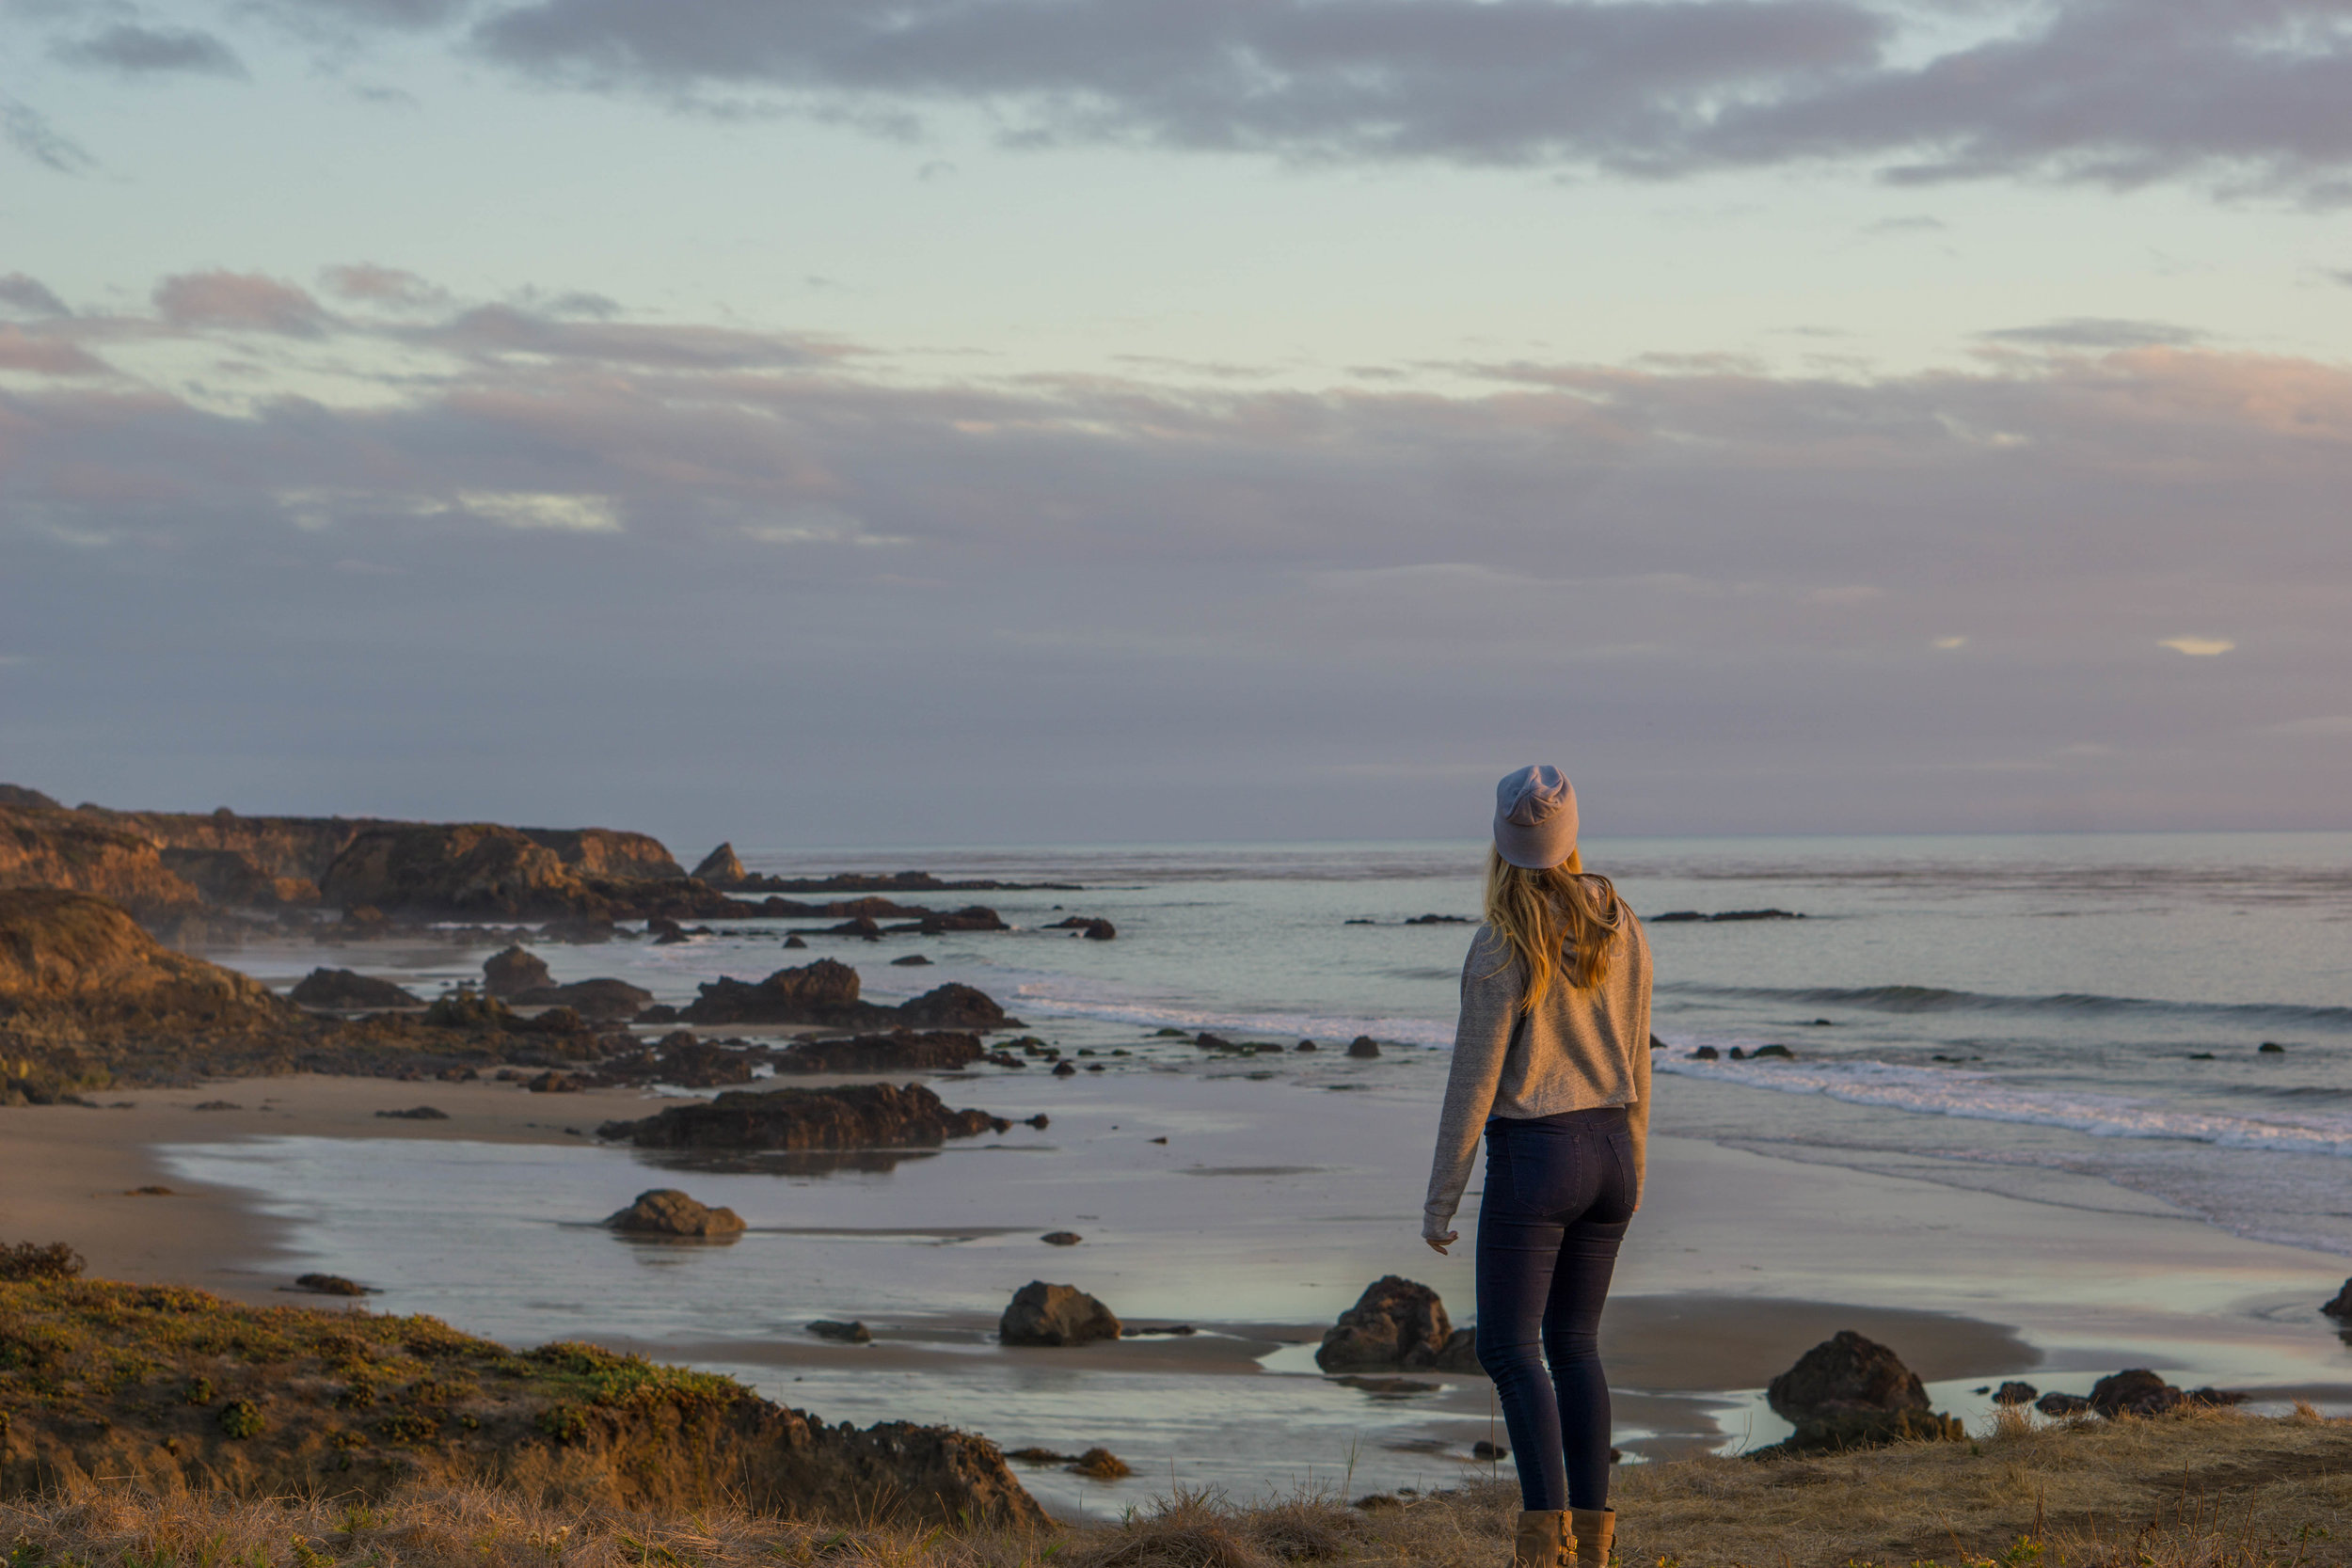 sara san simeon central coast sunset vanlife